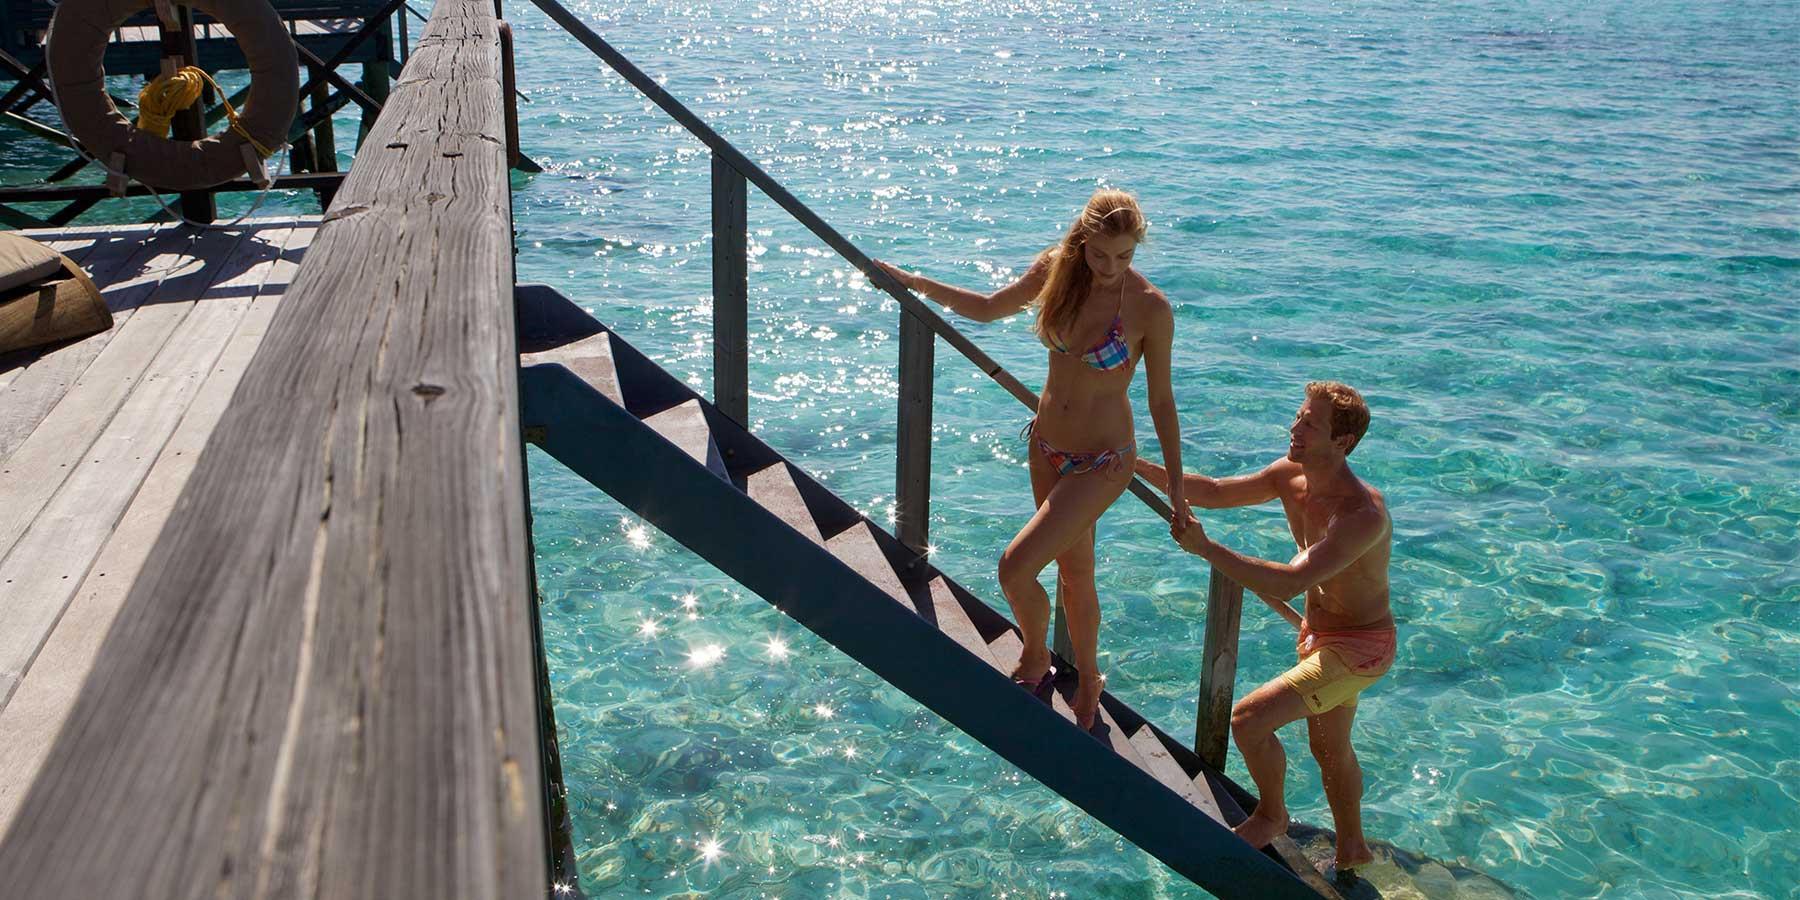 komandoo-maldives-island-resort-genel-004